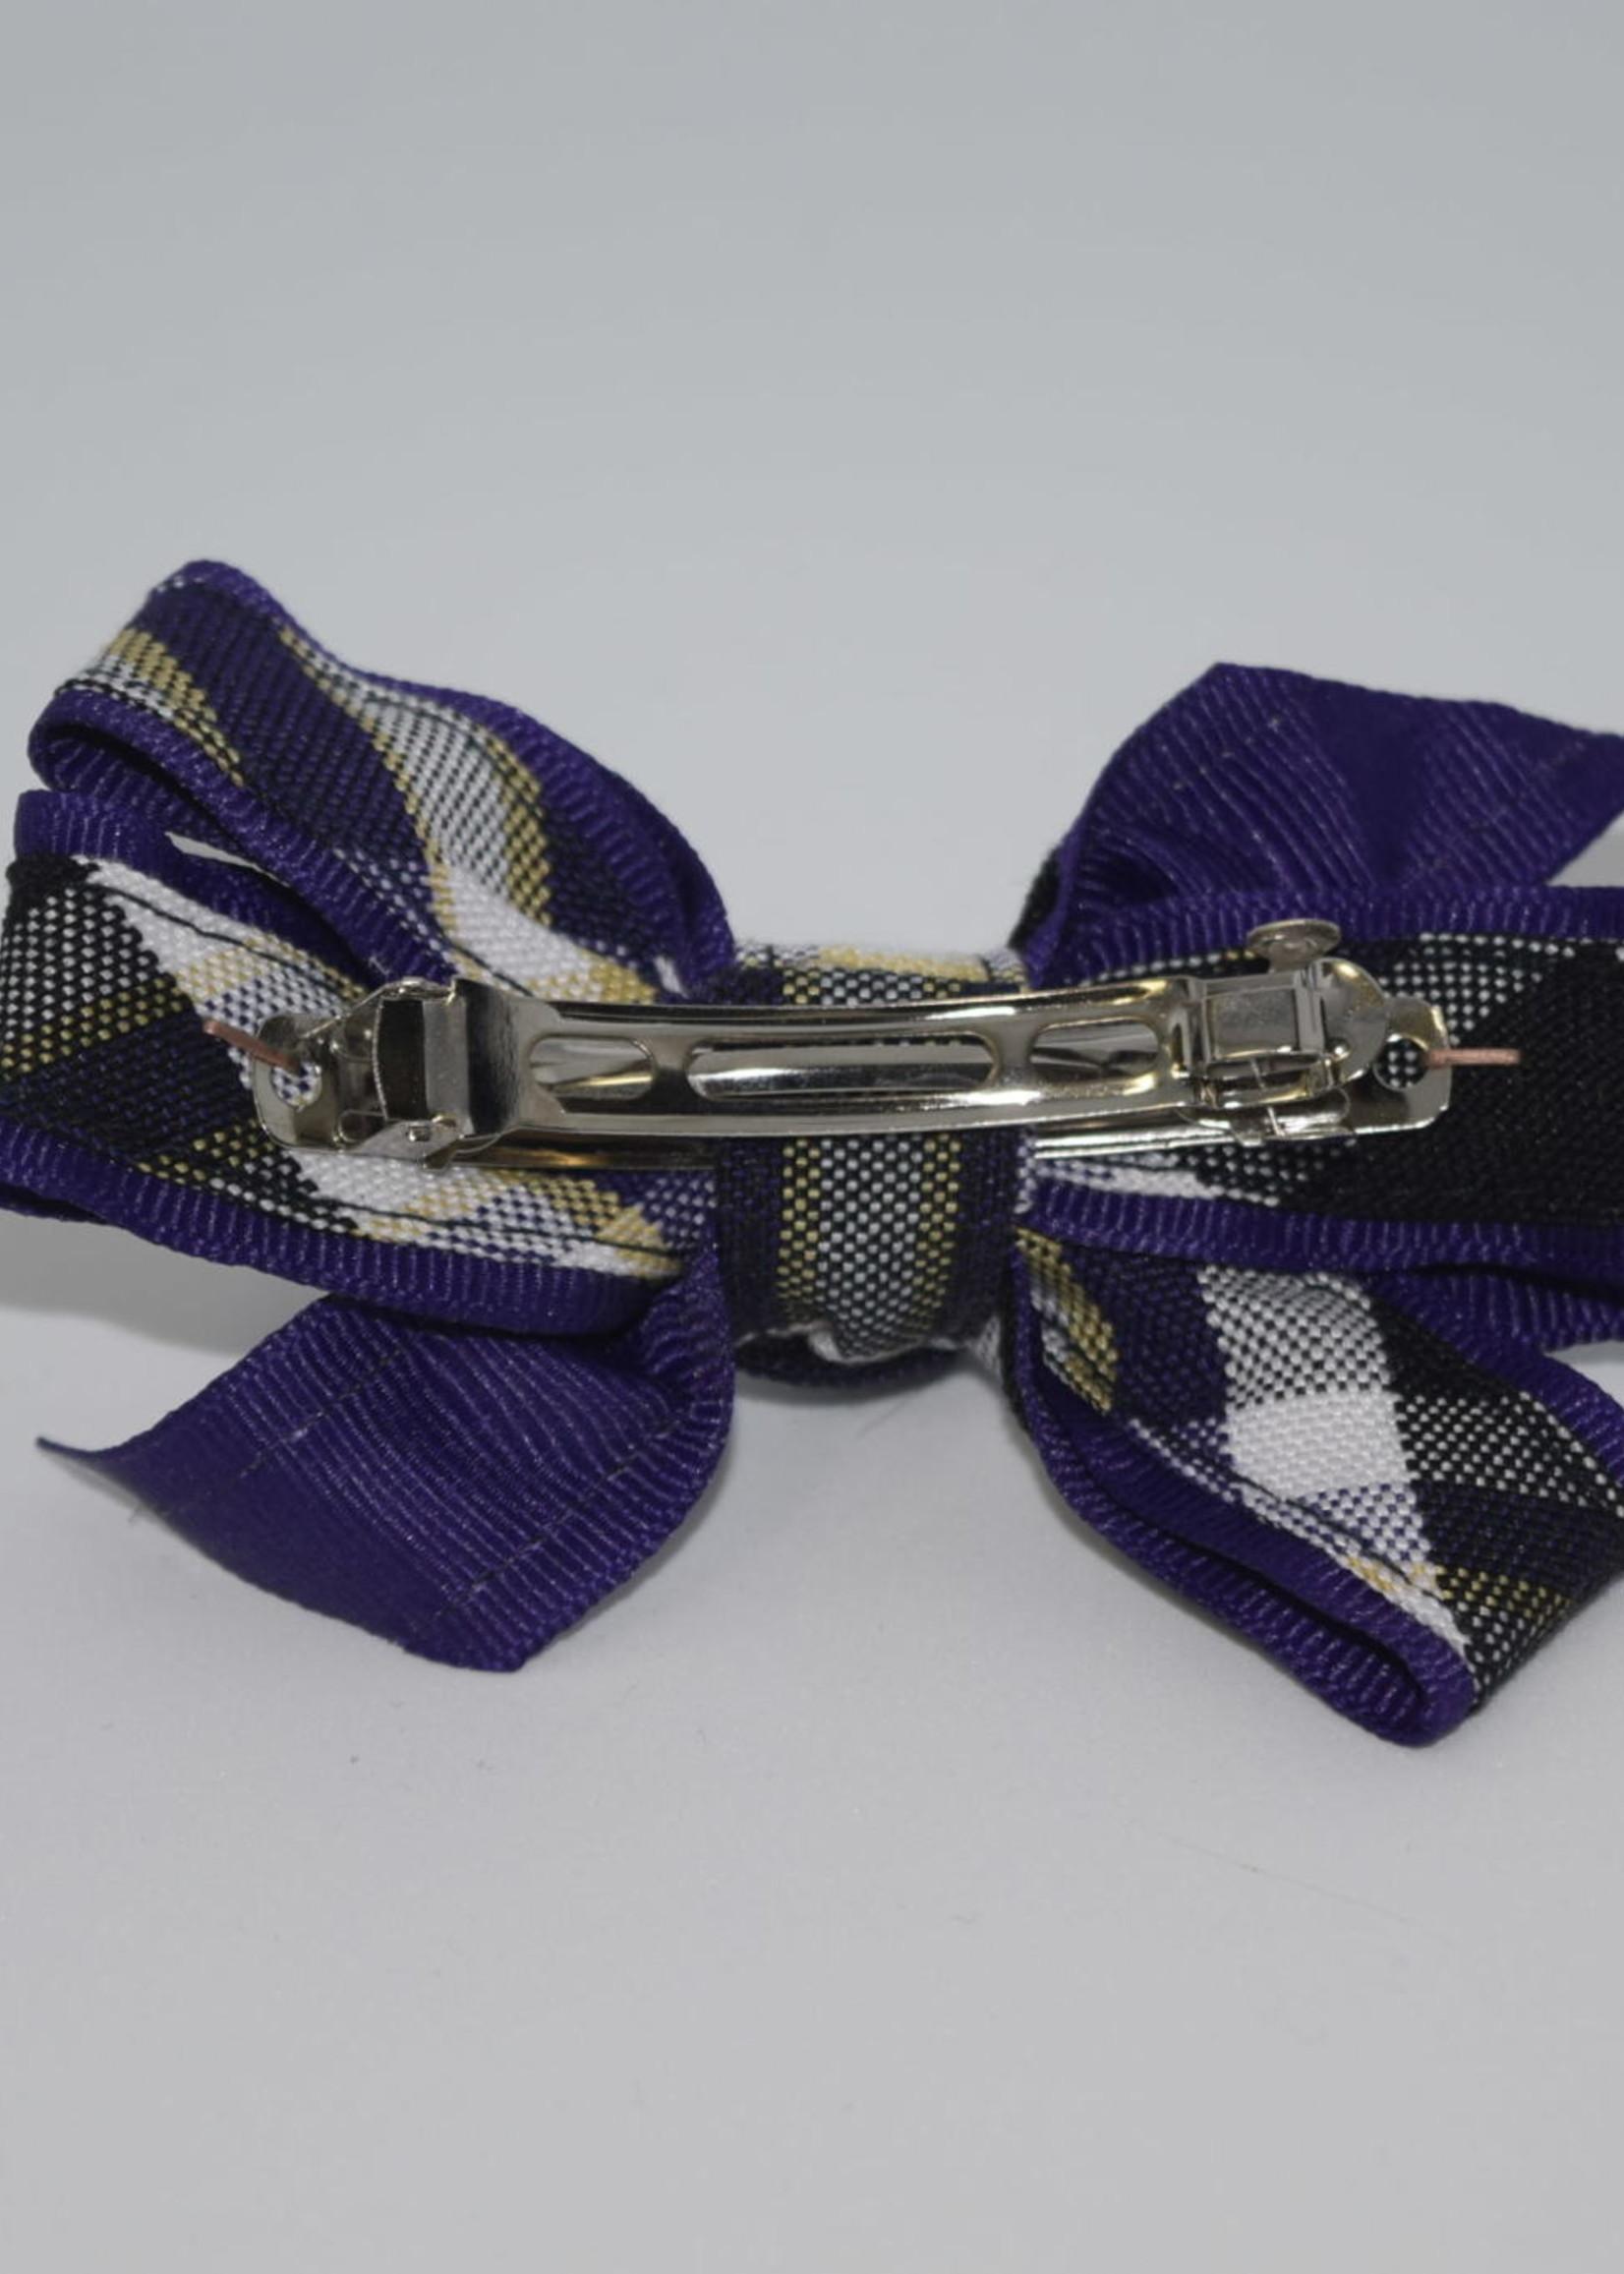 Monarch Bow P2M